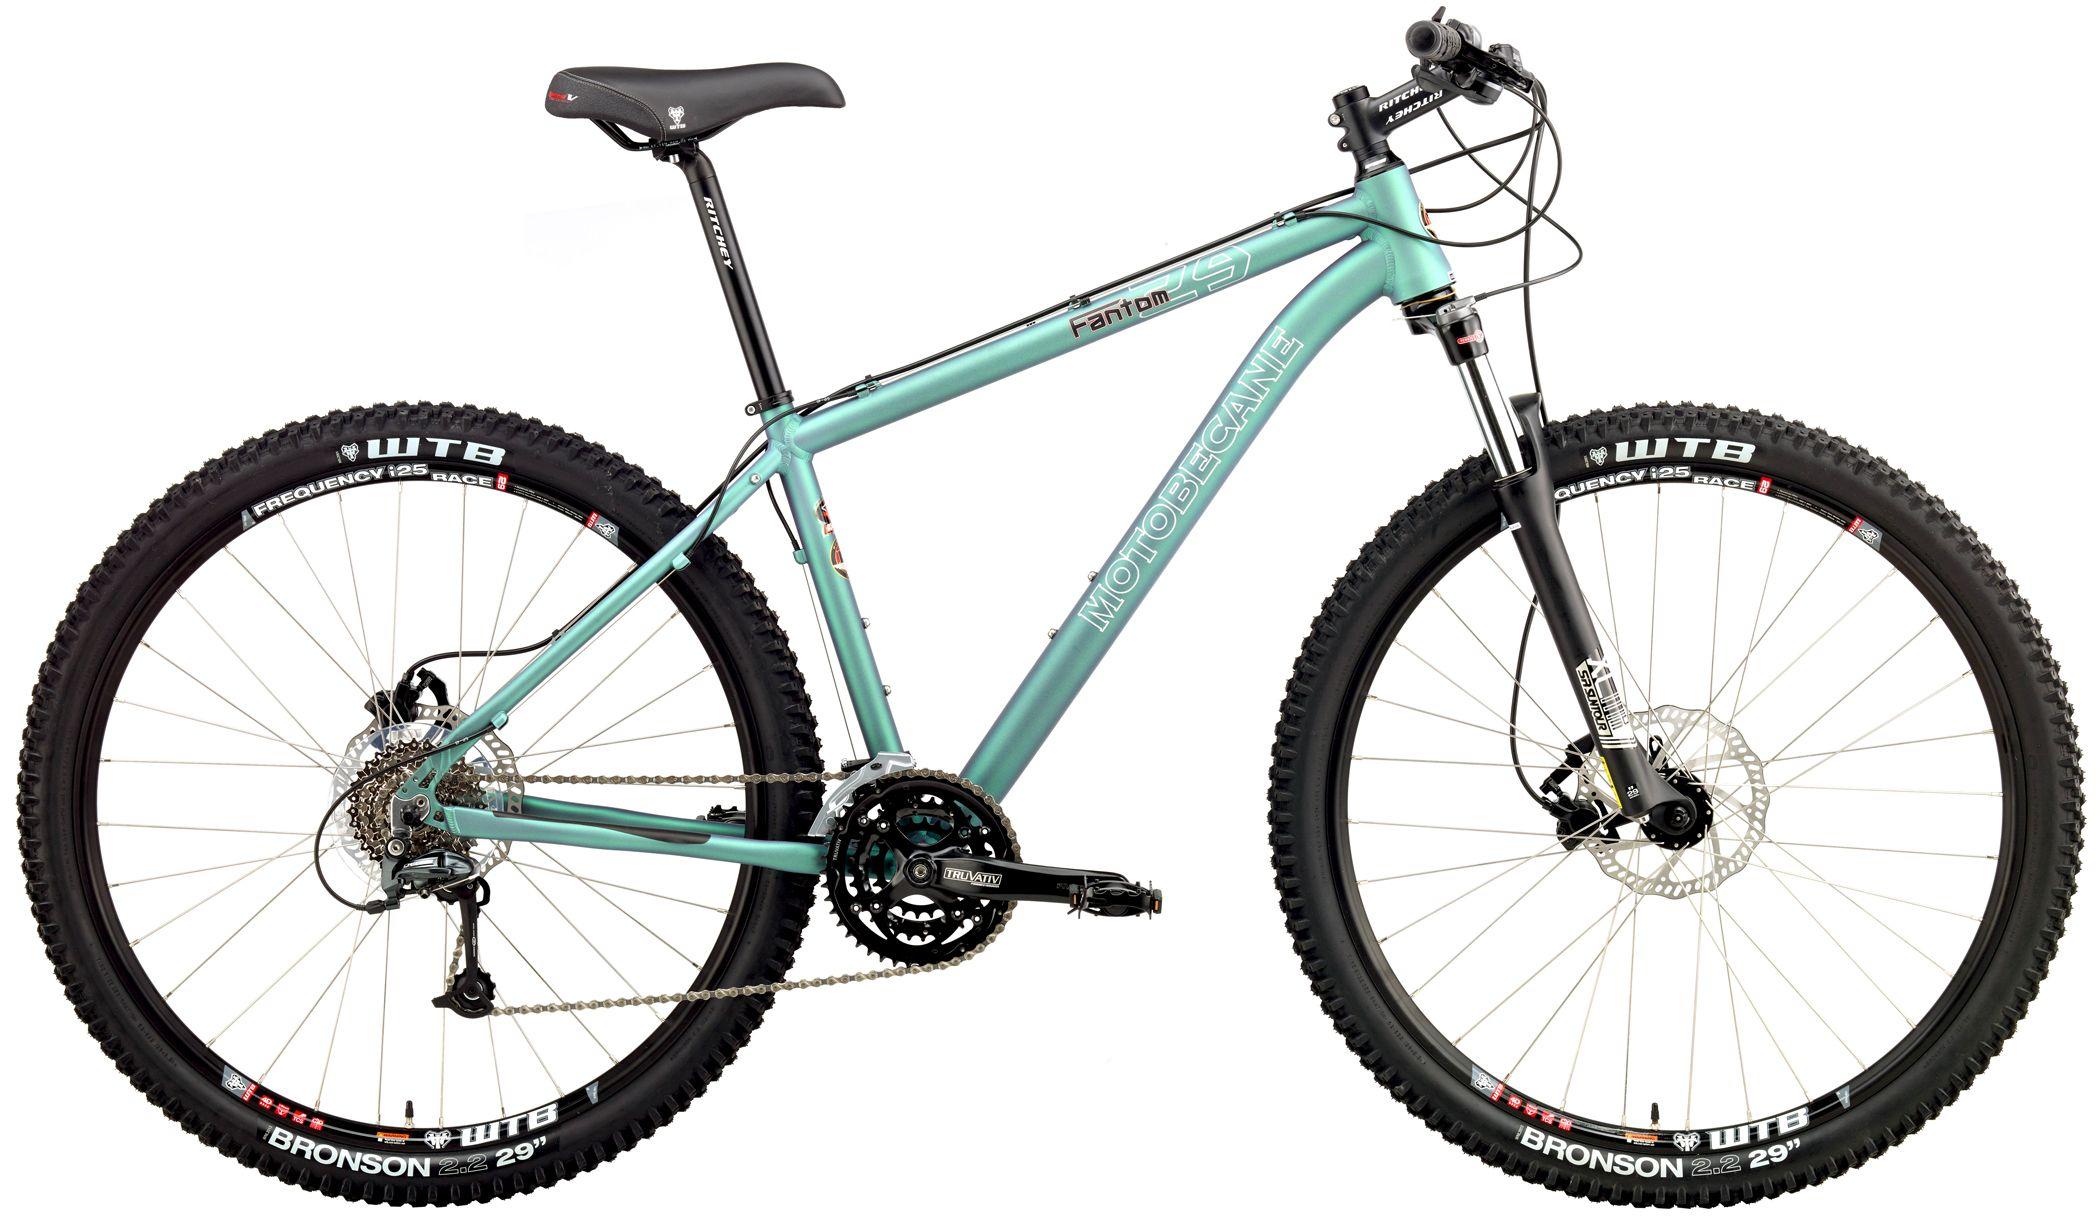 Mountain Bikes - MTB - Motobecane Fantom 2729DS Disc brakes, Tubeless Compatible Rims